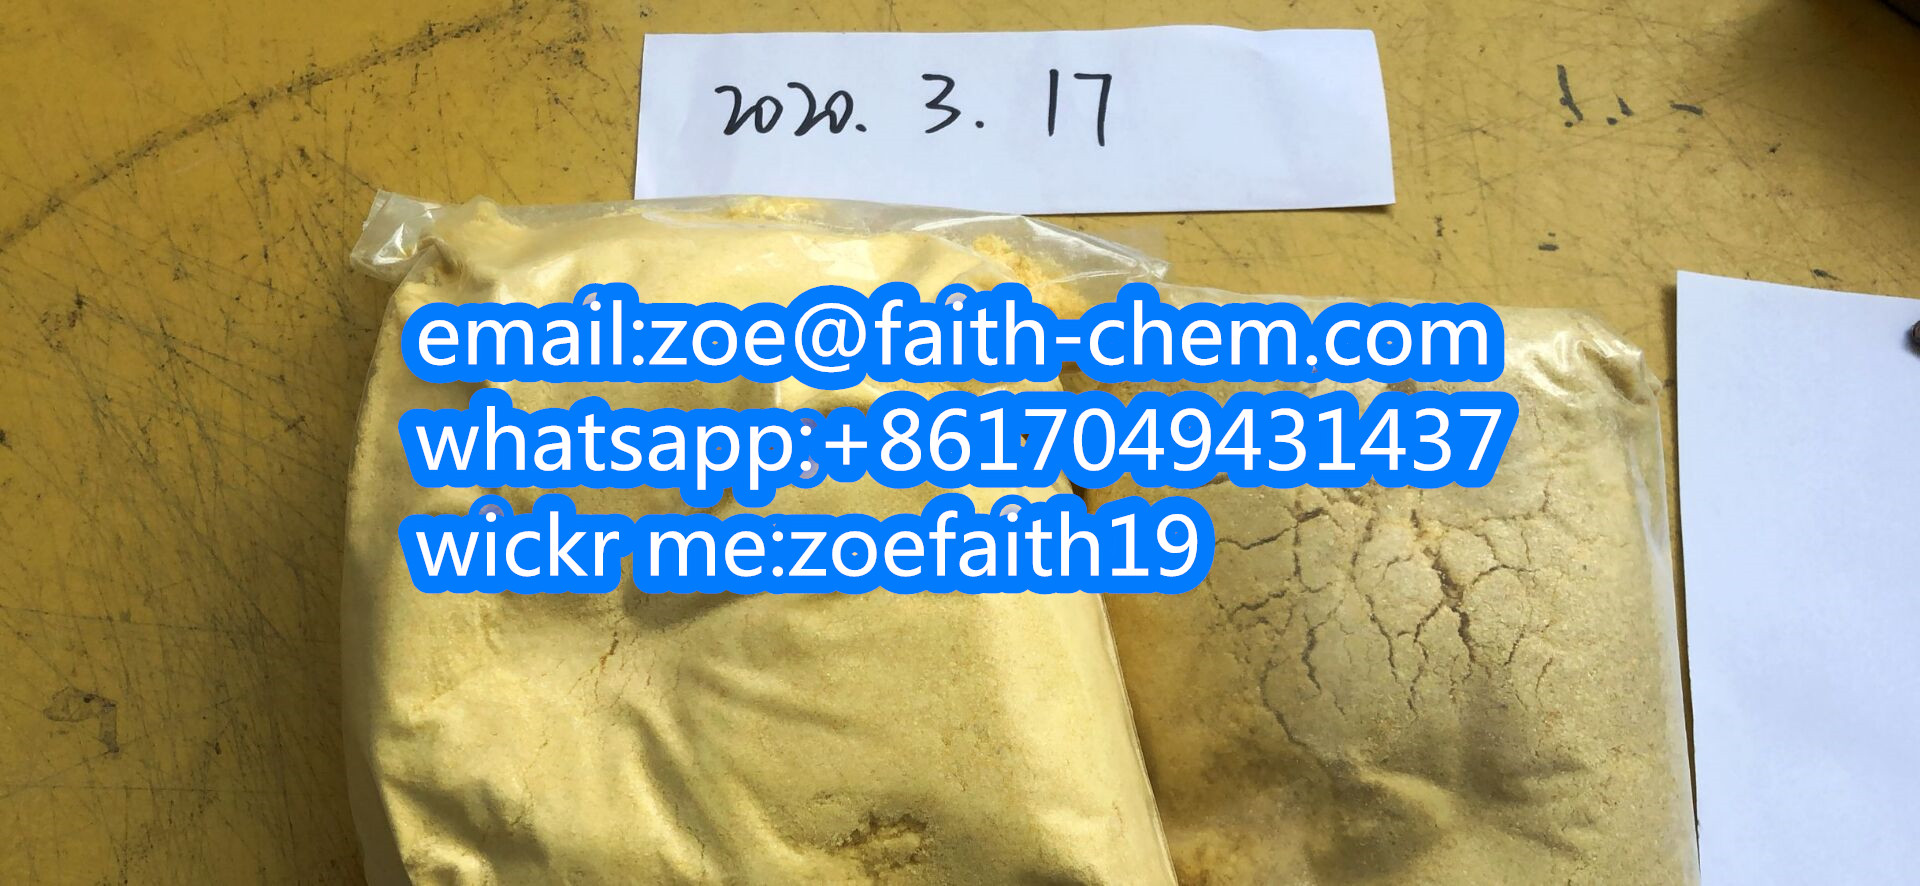 mmb-022 factory supply fub-amb mmb-022 strongest powder(whatsapp:+8617049431437)